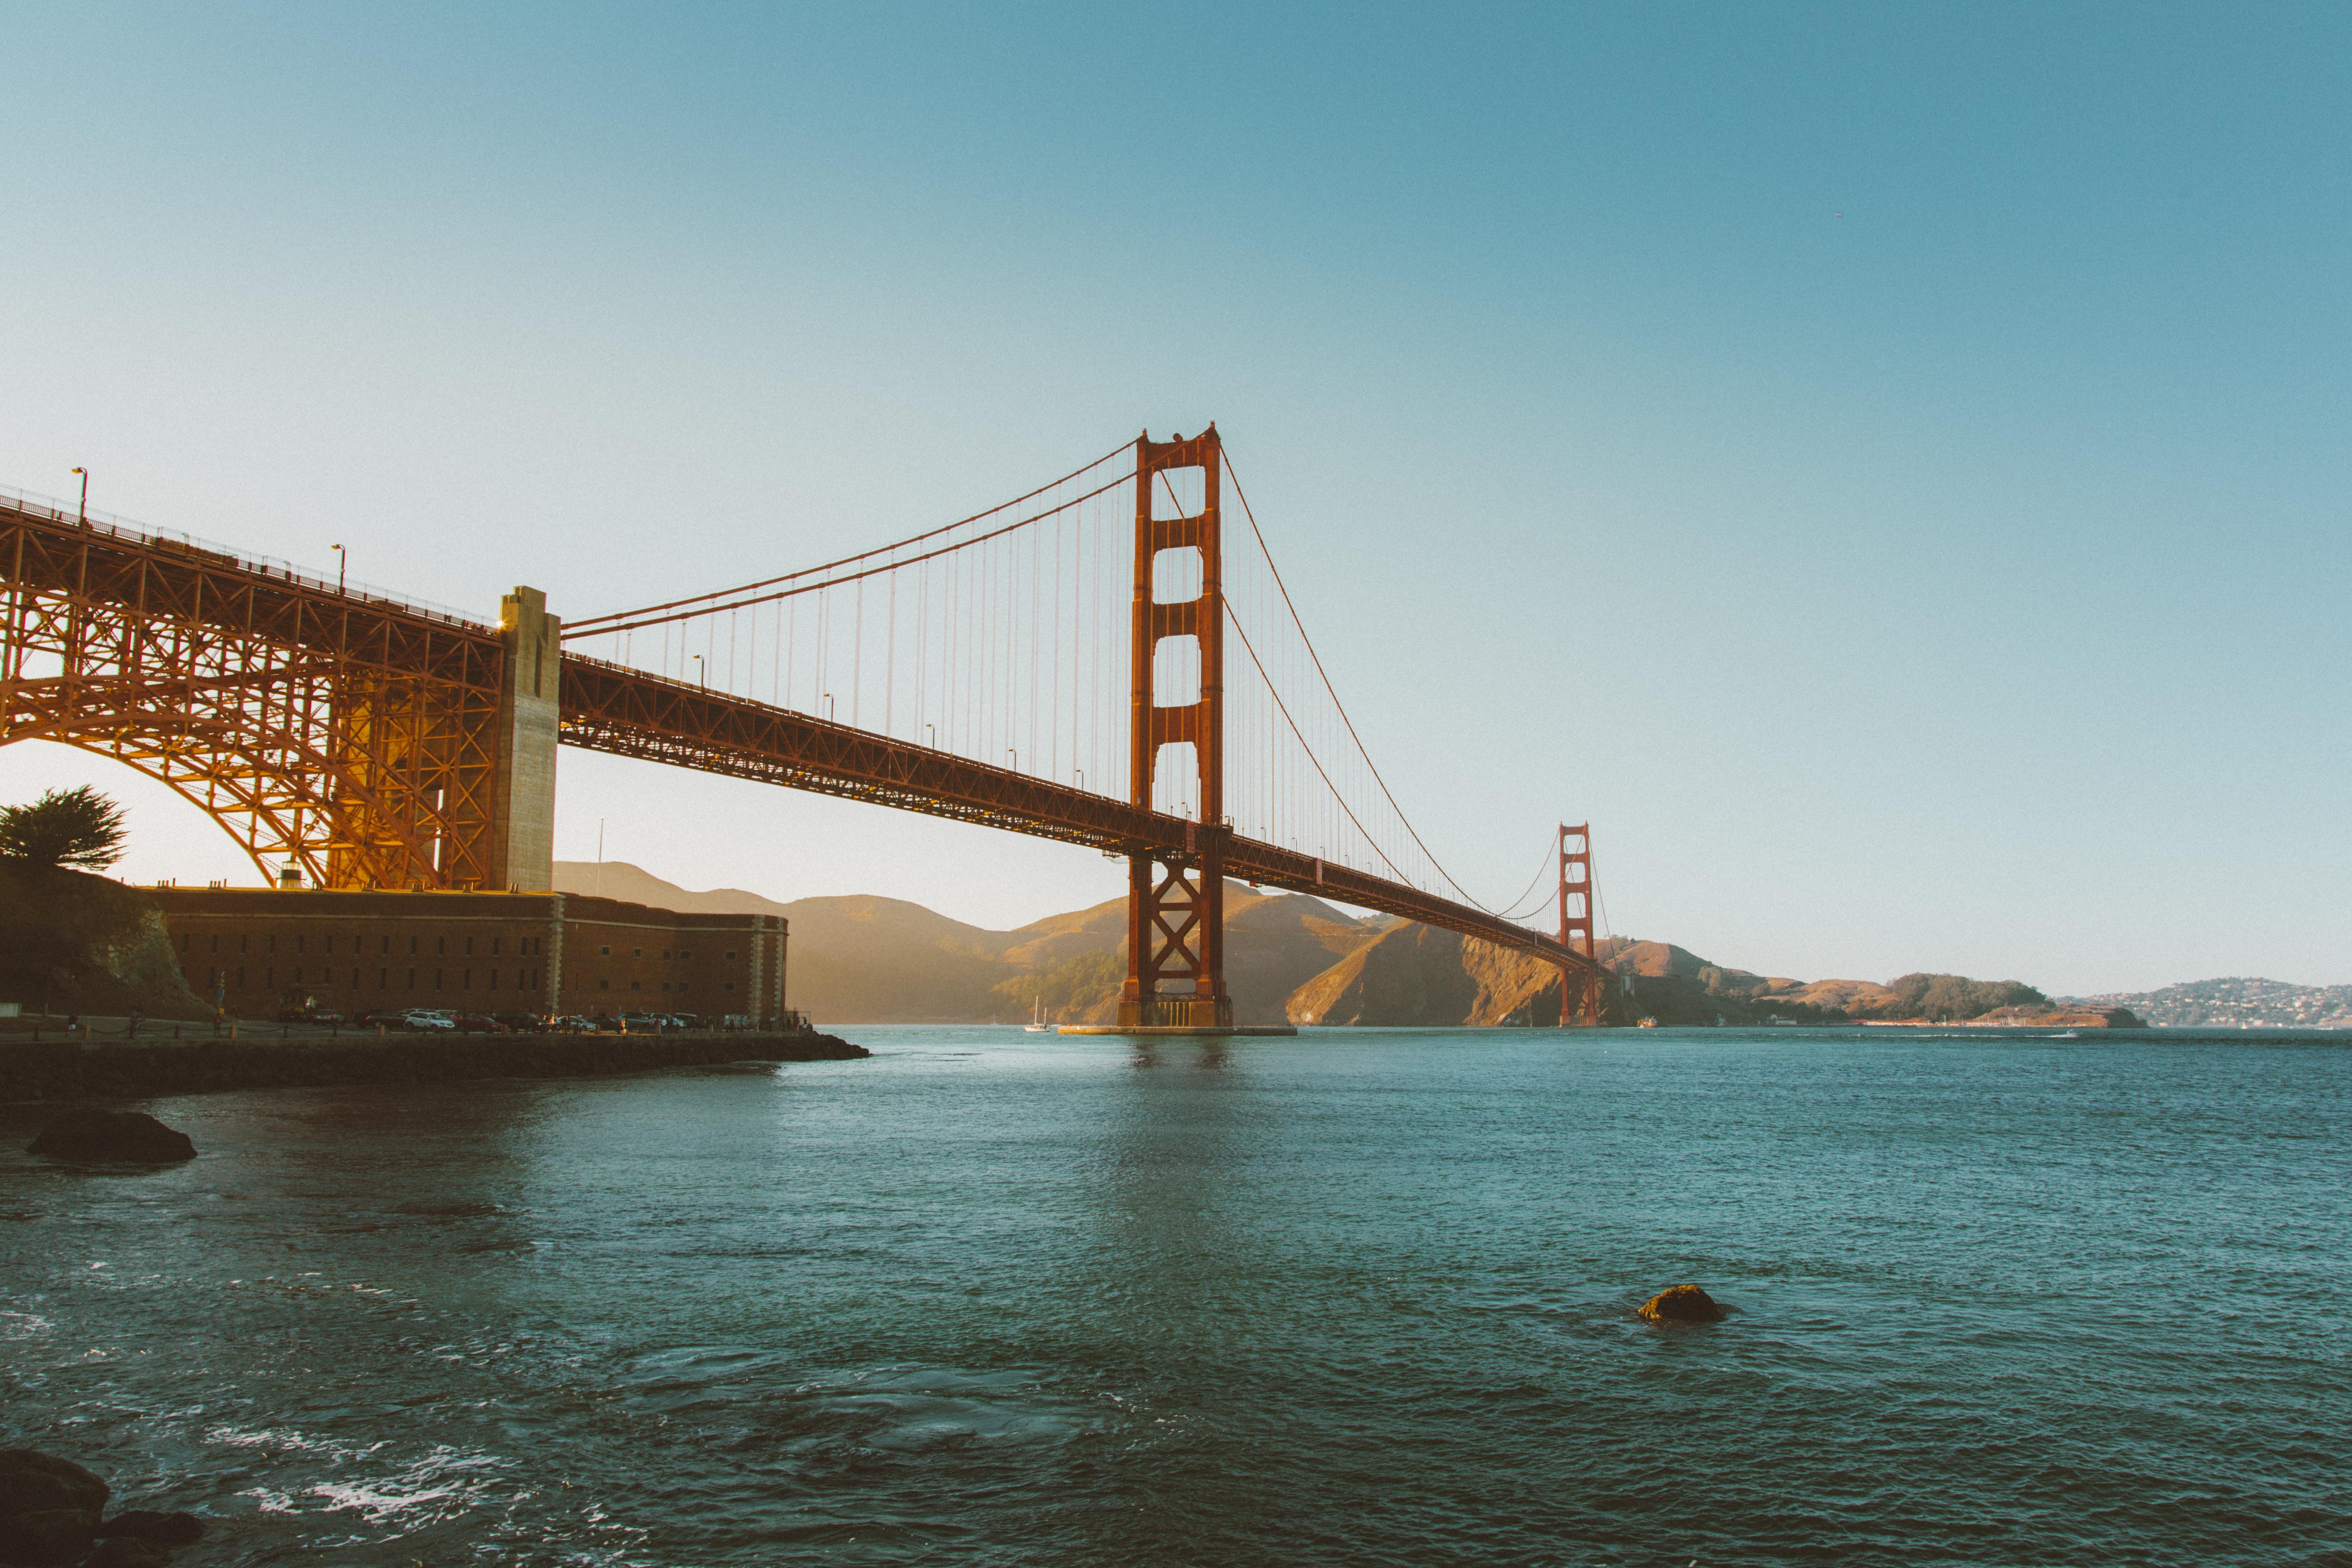 Golden Gate, Architecture, Blue, Bridge, Engineering, HQ Photo